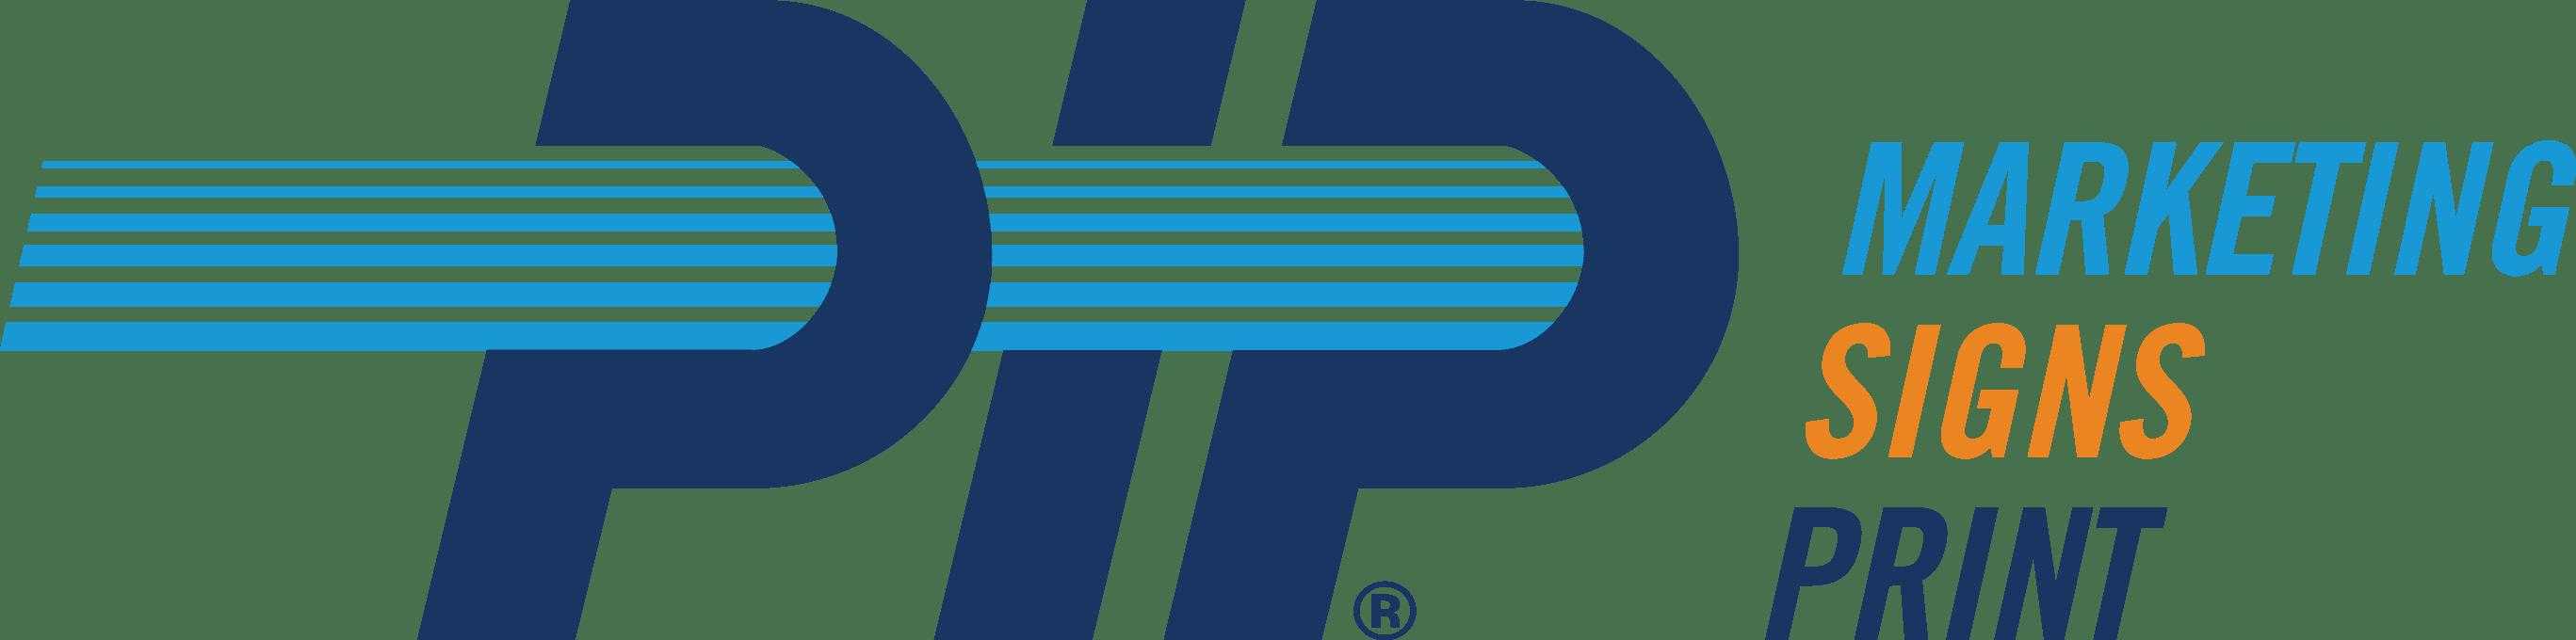 PIP Marketing Signs Print logo